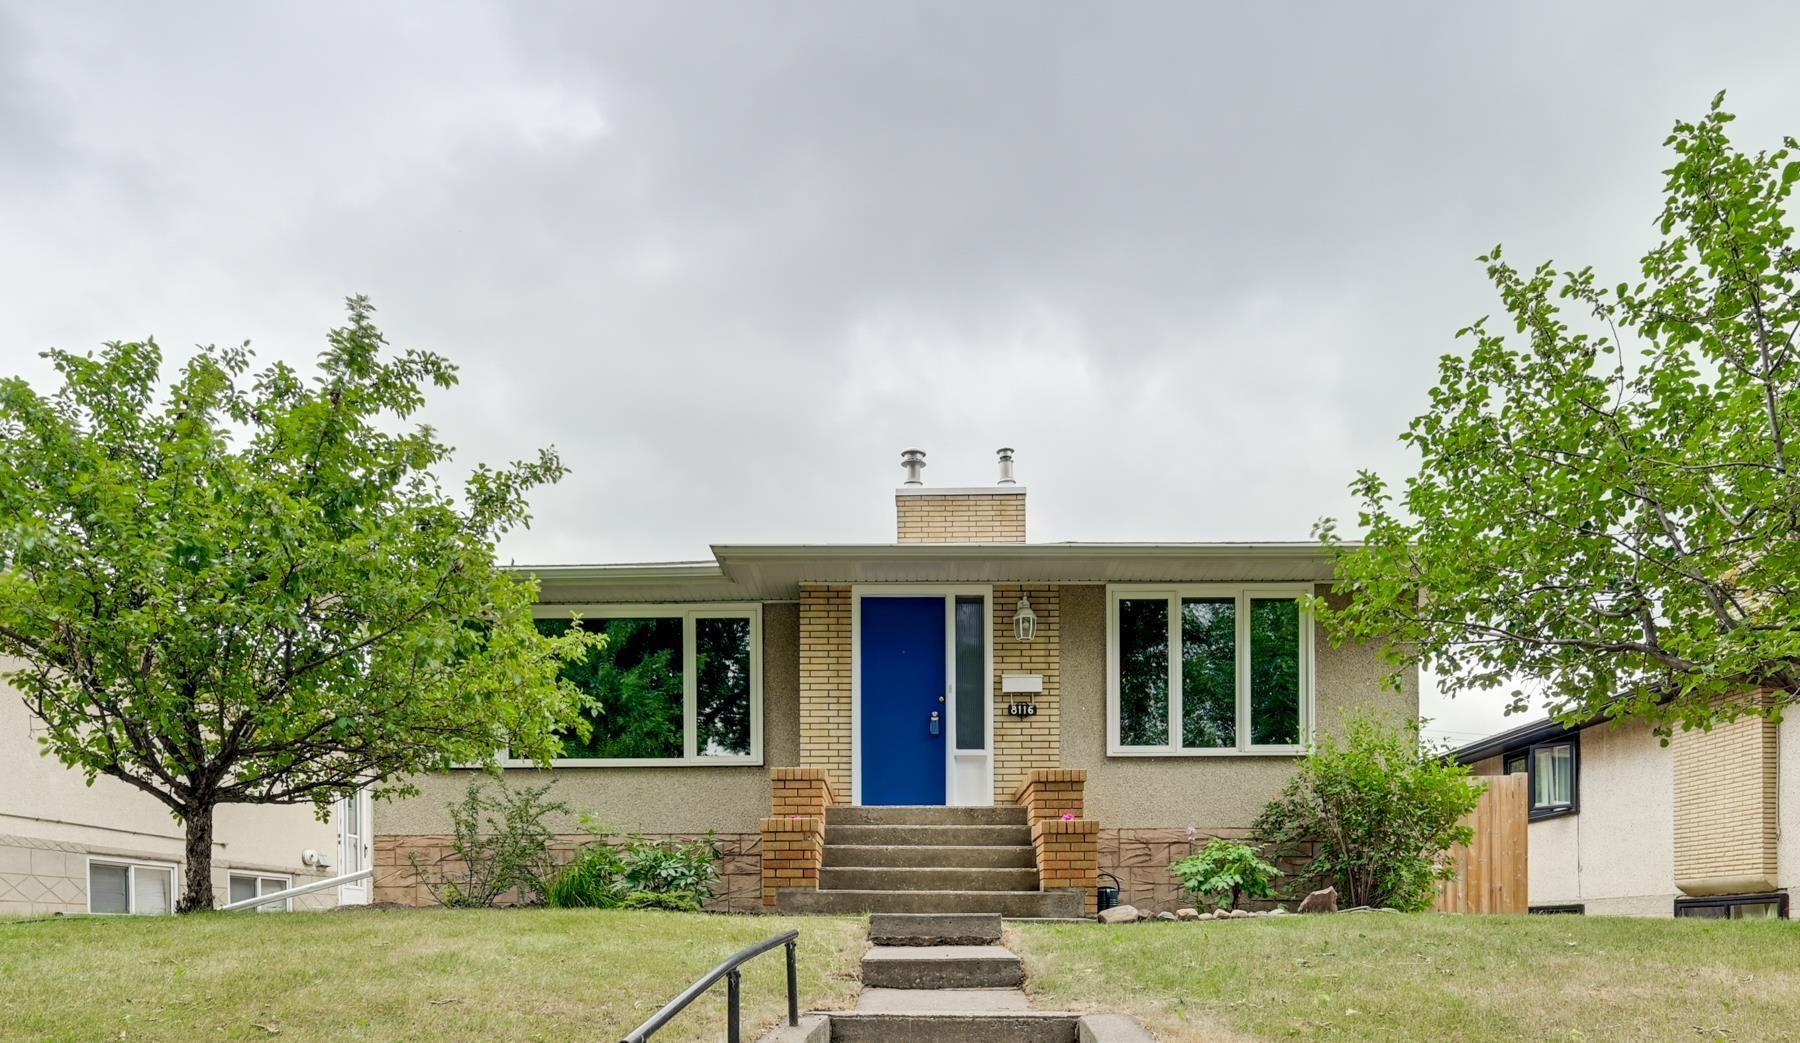 Main Photo: 8116 96 Avenue in Edmonton: Zone 18 House for sale : MLS®# E4253261